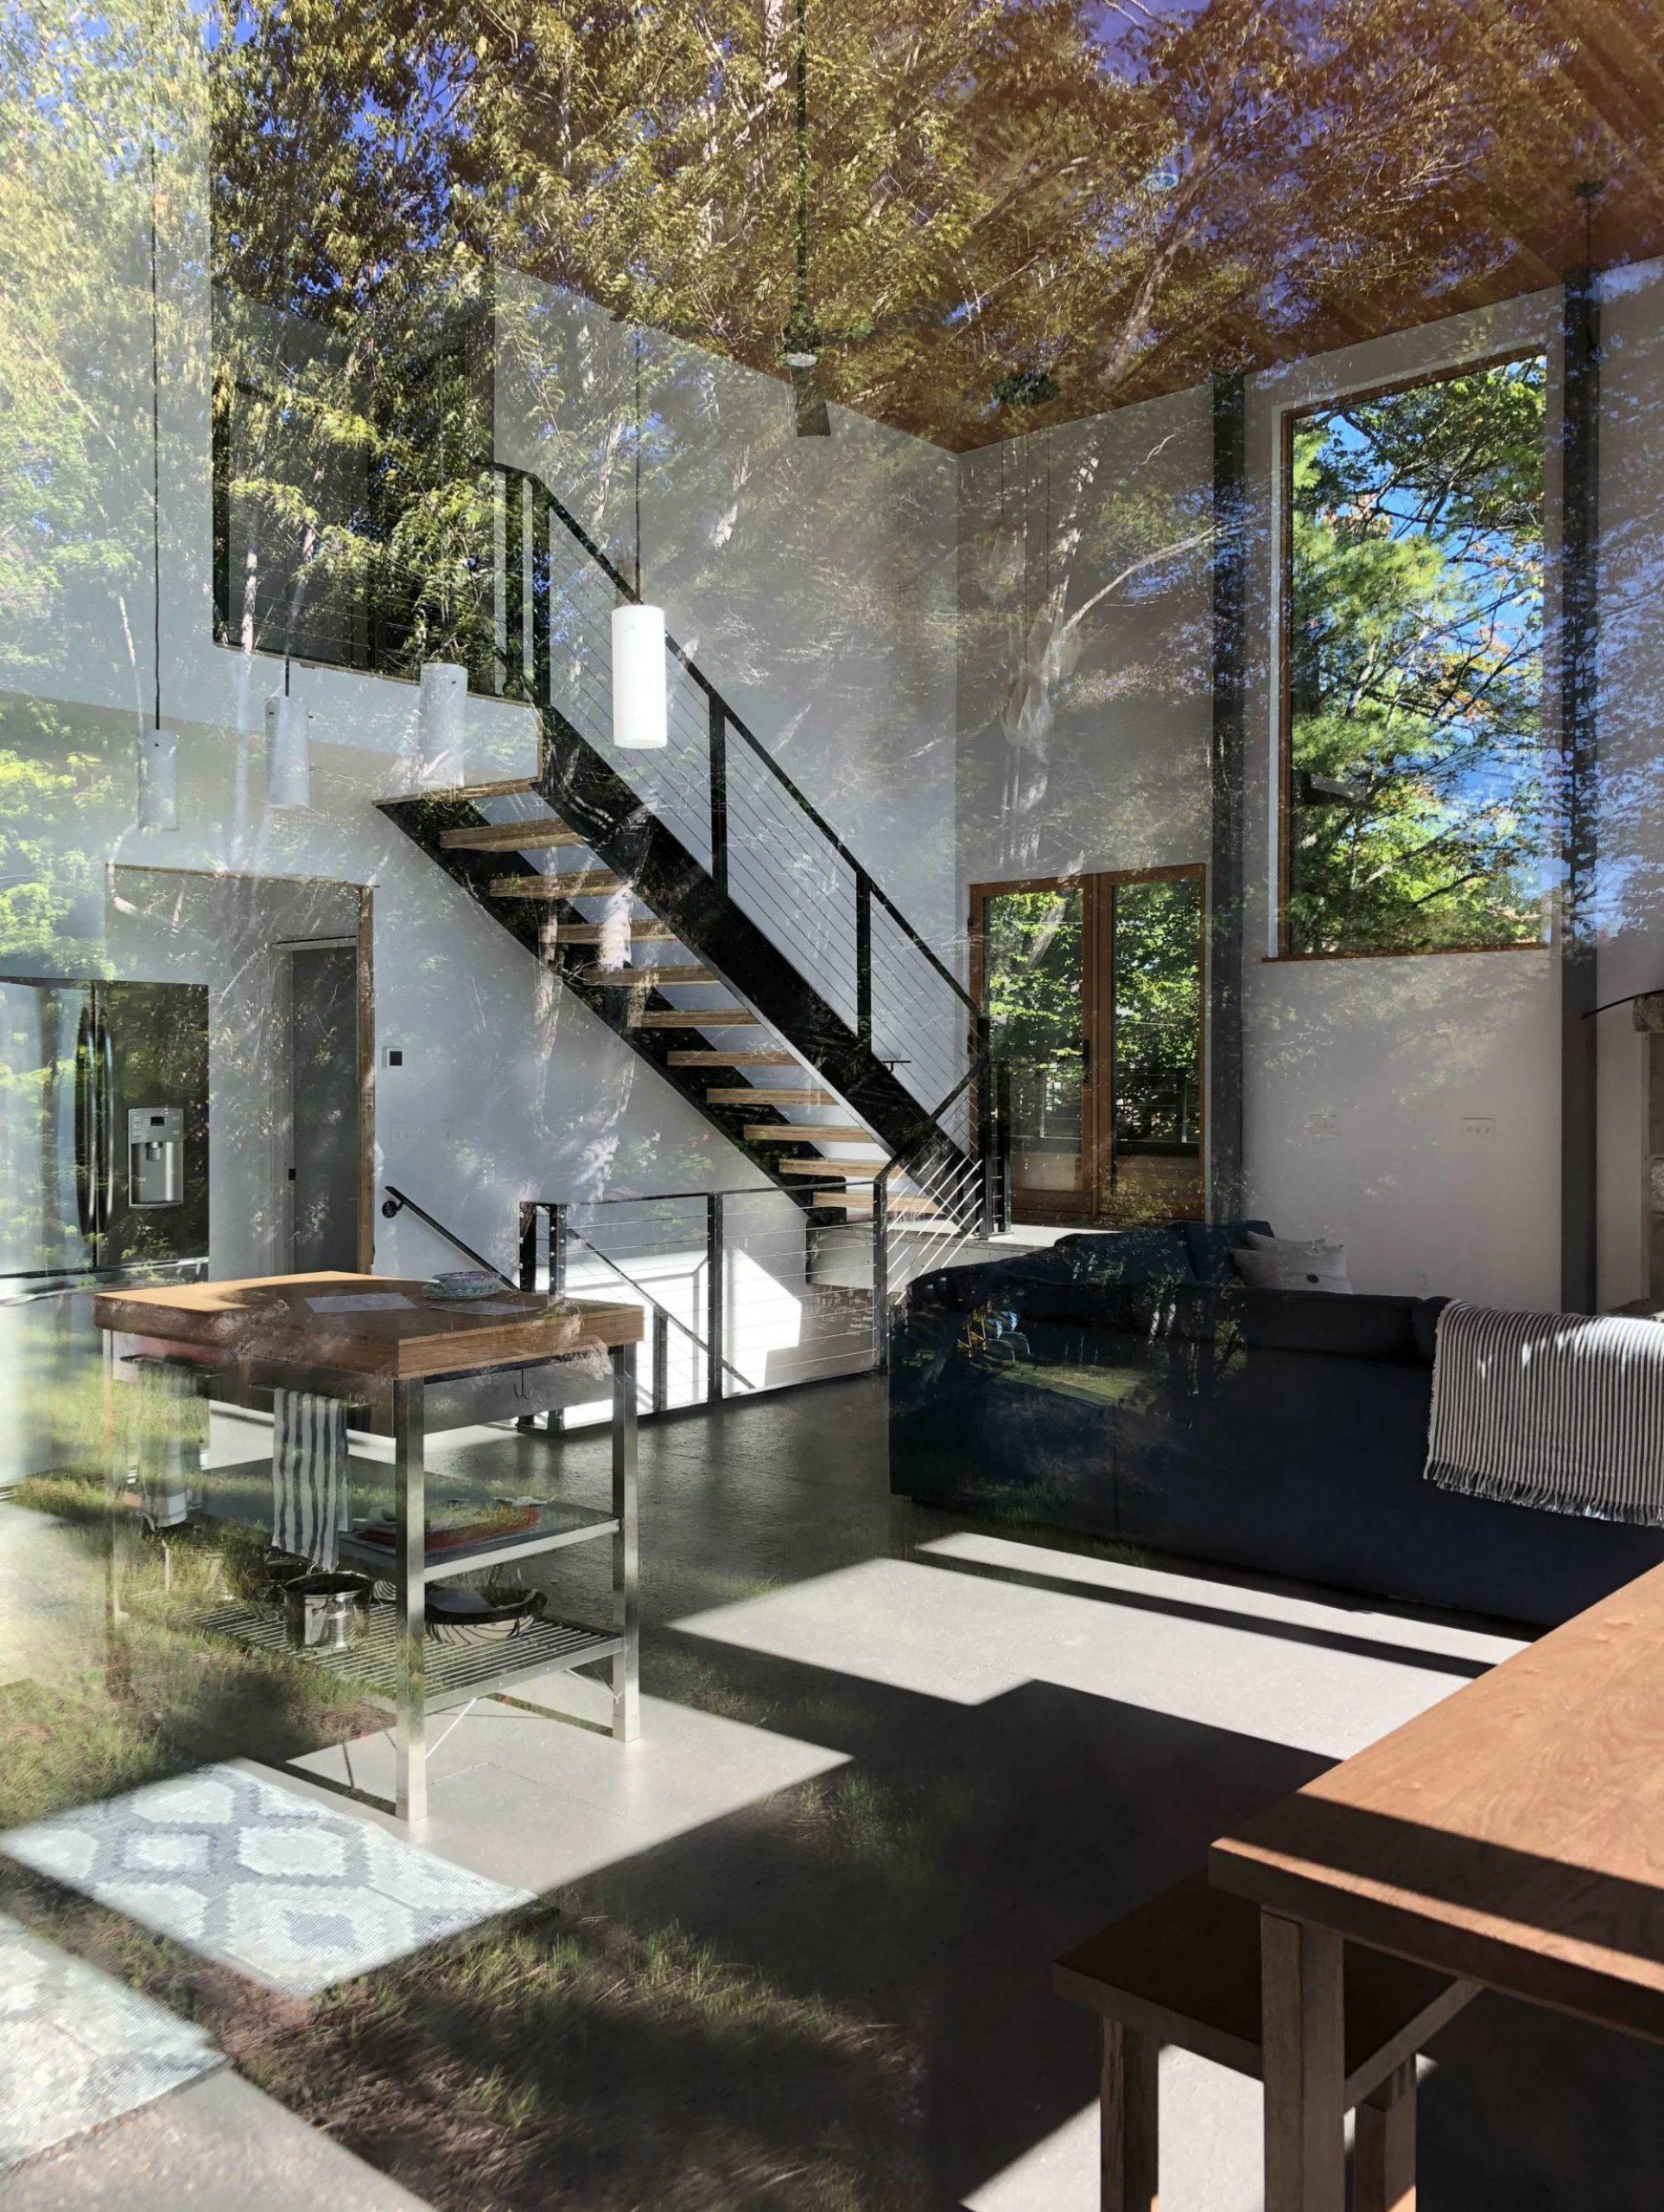 G.L. Frost architecture